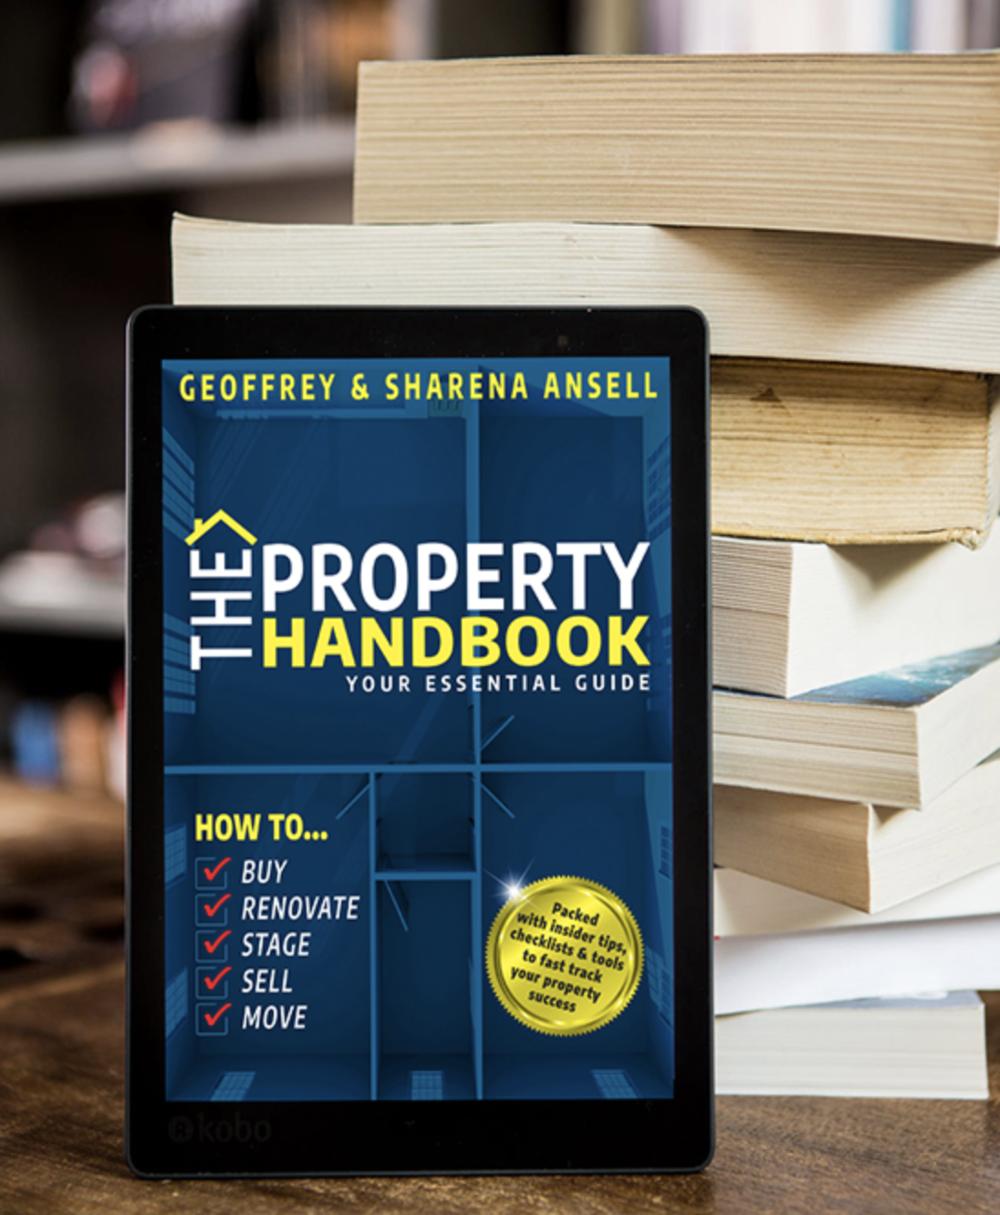 The Property Handbook